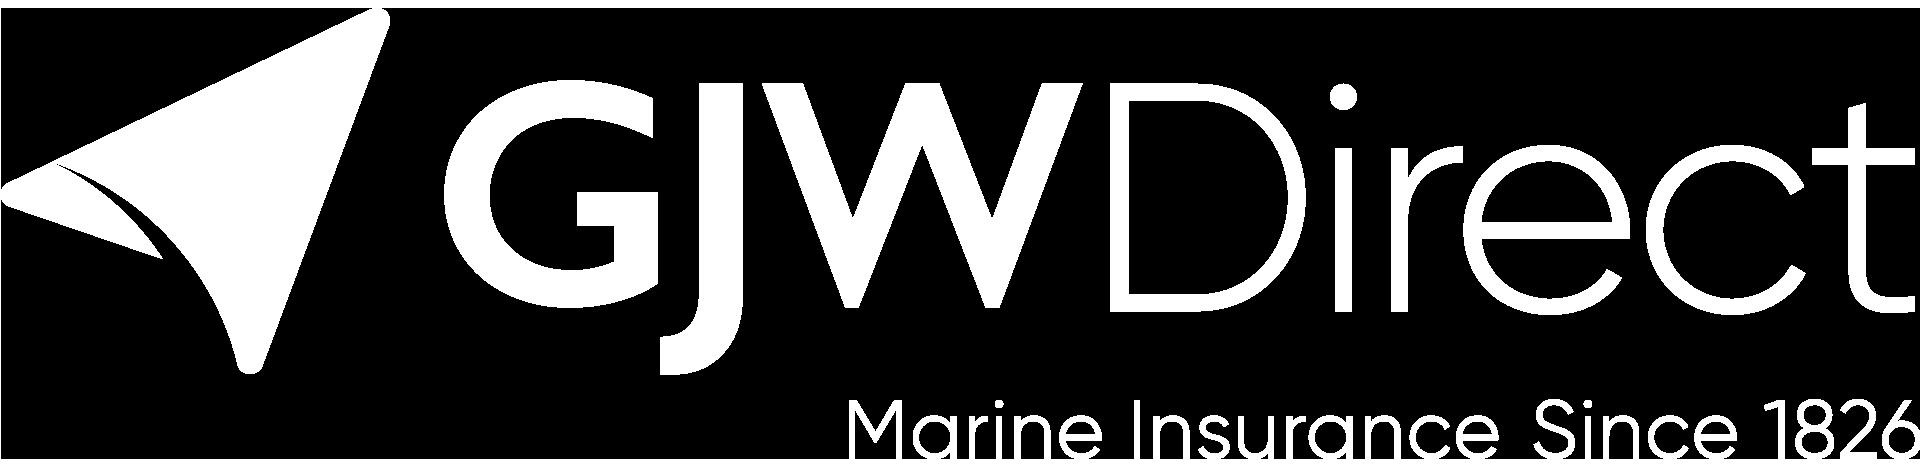 https://info.gjwdirect.com/hubfs/white-marine-insurance.png